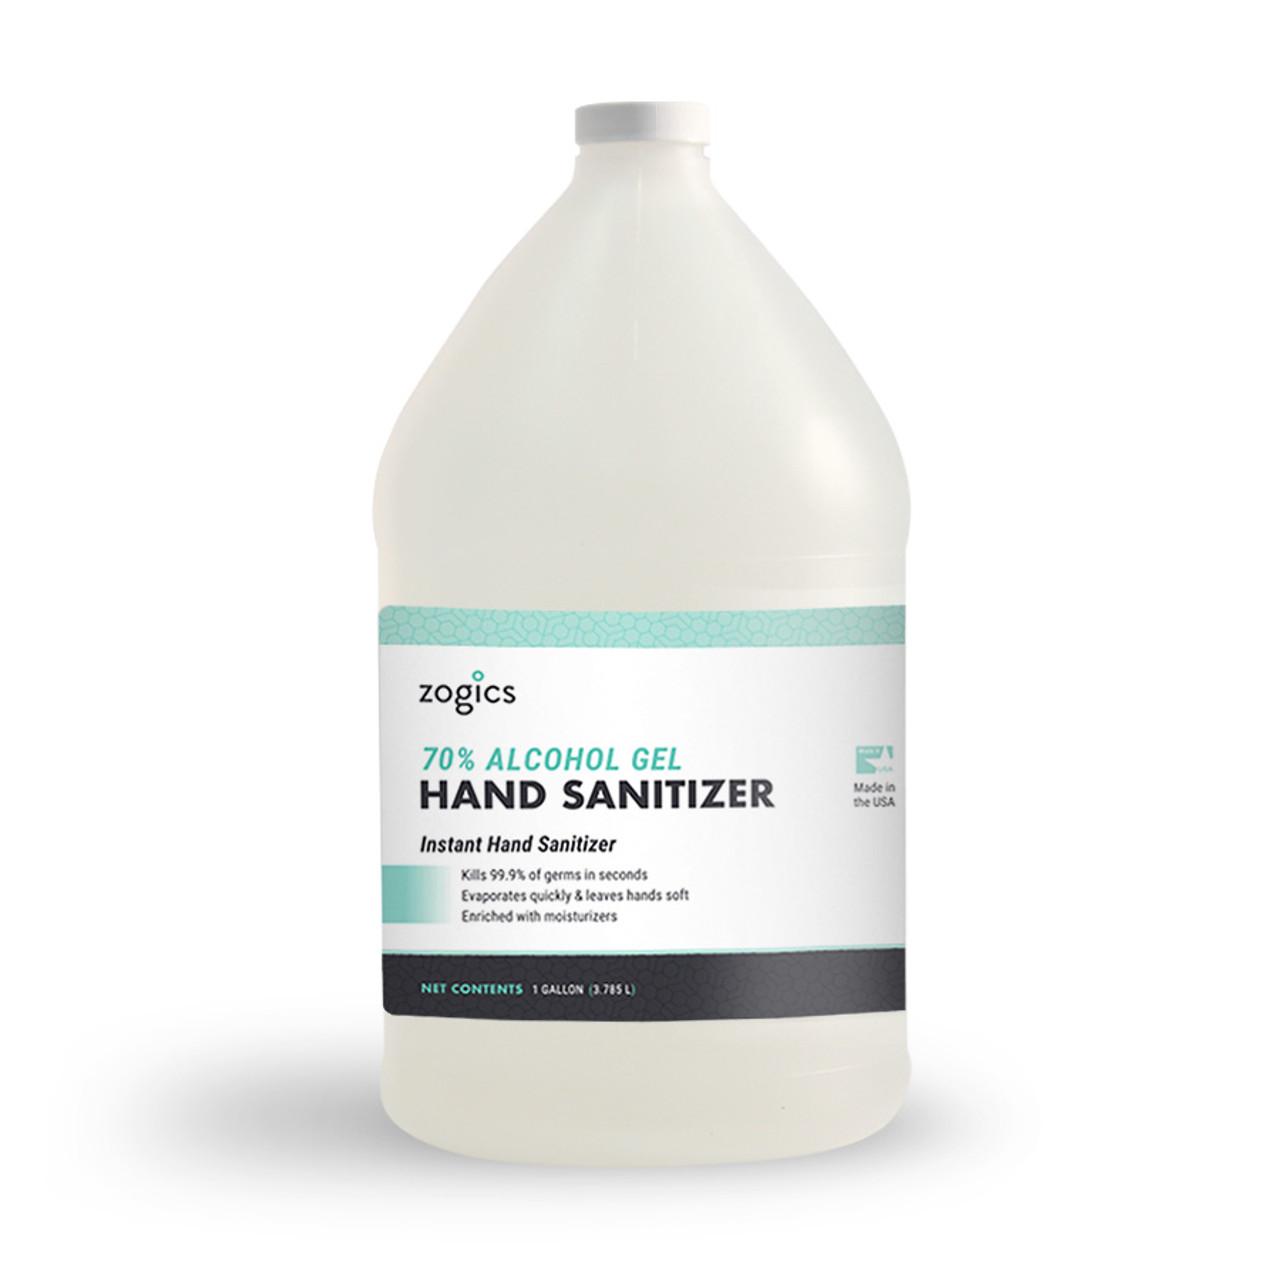 Zogics 70% Alcohol Gel Hand Sanitizer